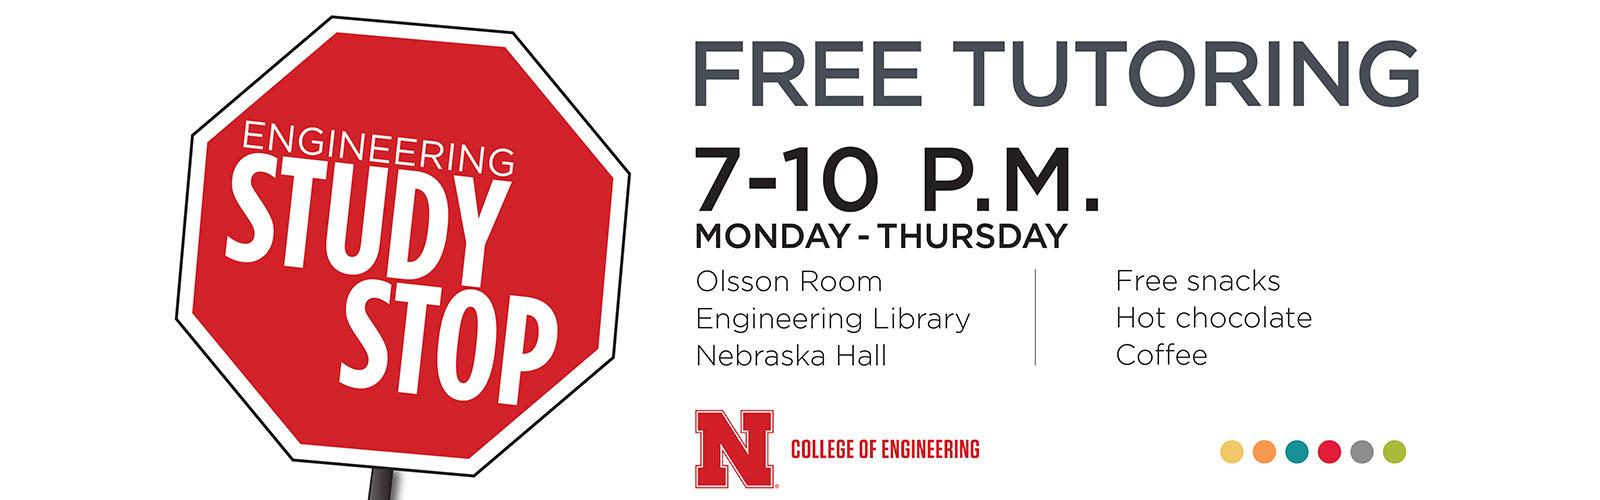 Engineering Study Stop - Free Tutoring. 7-10pm Monday-Thursday. Olsson Room, Engineering Library, Nebraska Hall. Free snacks, Hot Chocolate and coffee.